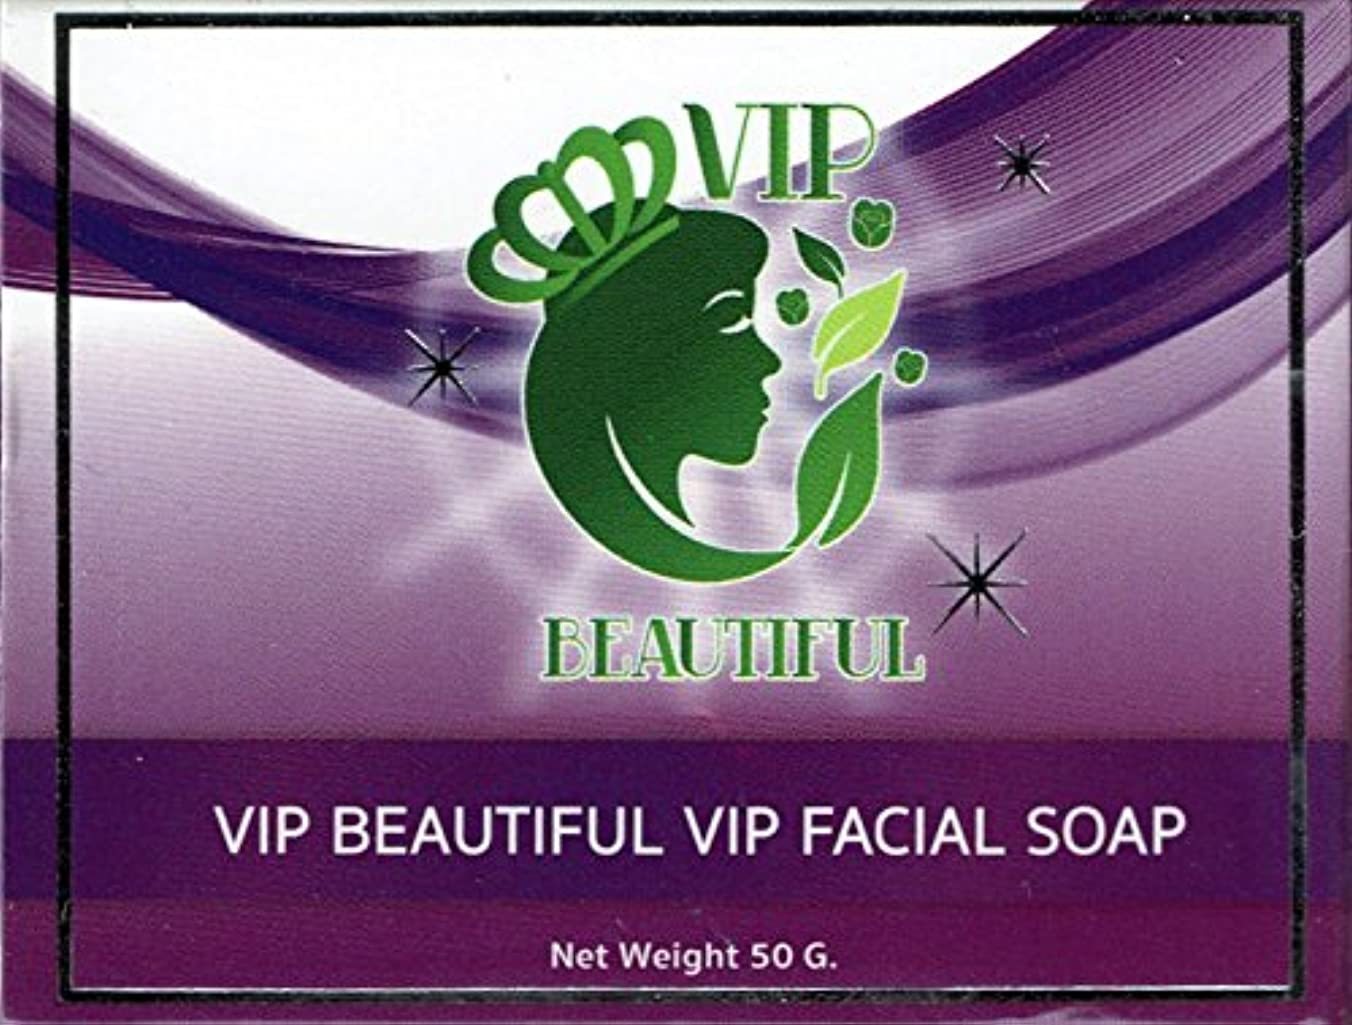 VIP BEAUTIFUL VIP FACIAL SOAP タイ 石鹸